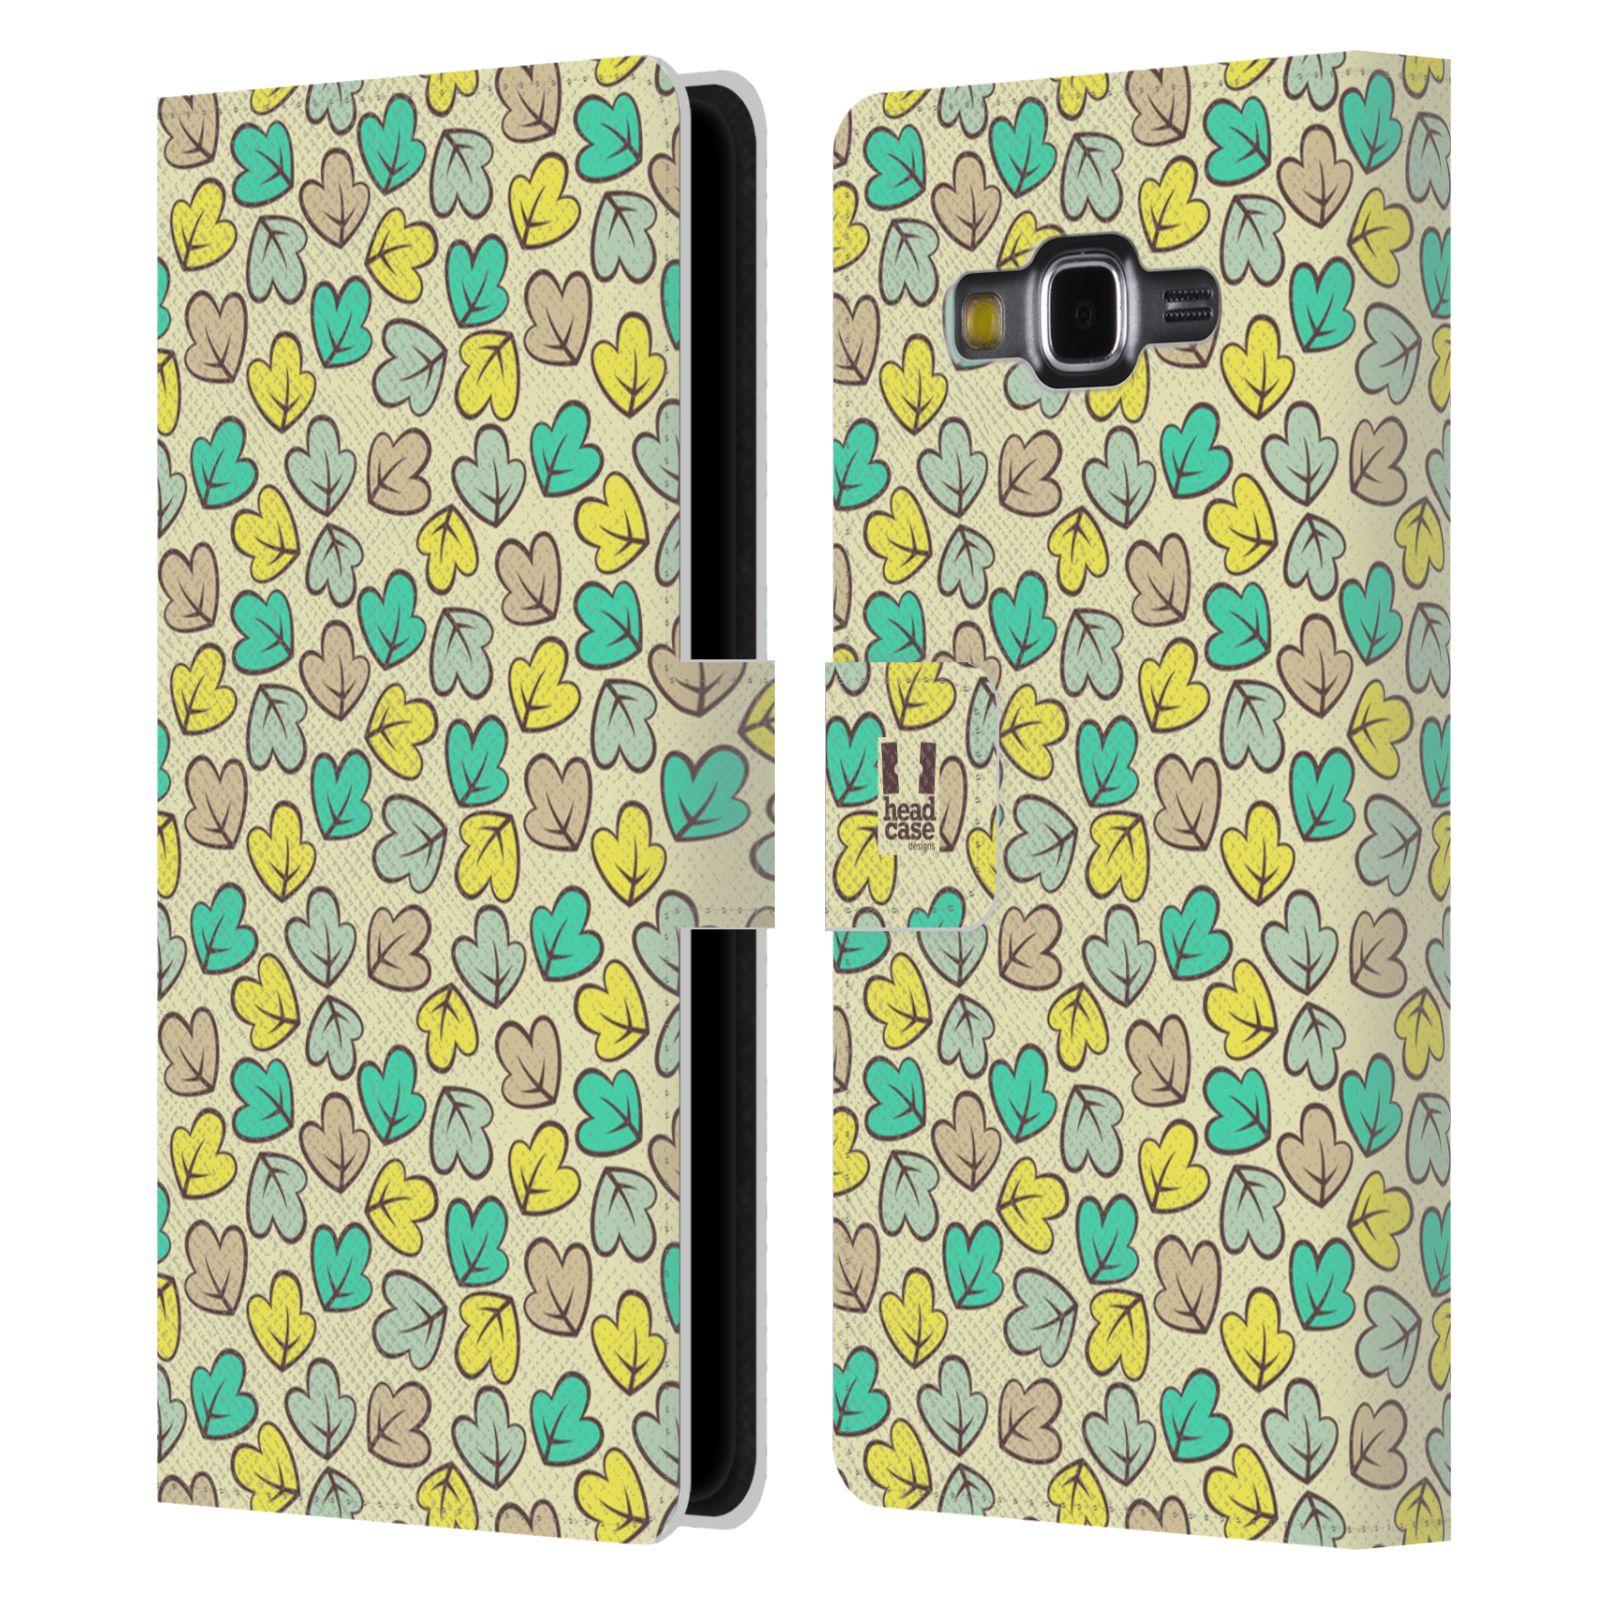 HEAD CASE Flipové pouzdro pro mobil Samsung Galaxy Grand PRIME vzory listy zelená a béžová